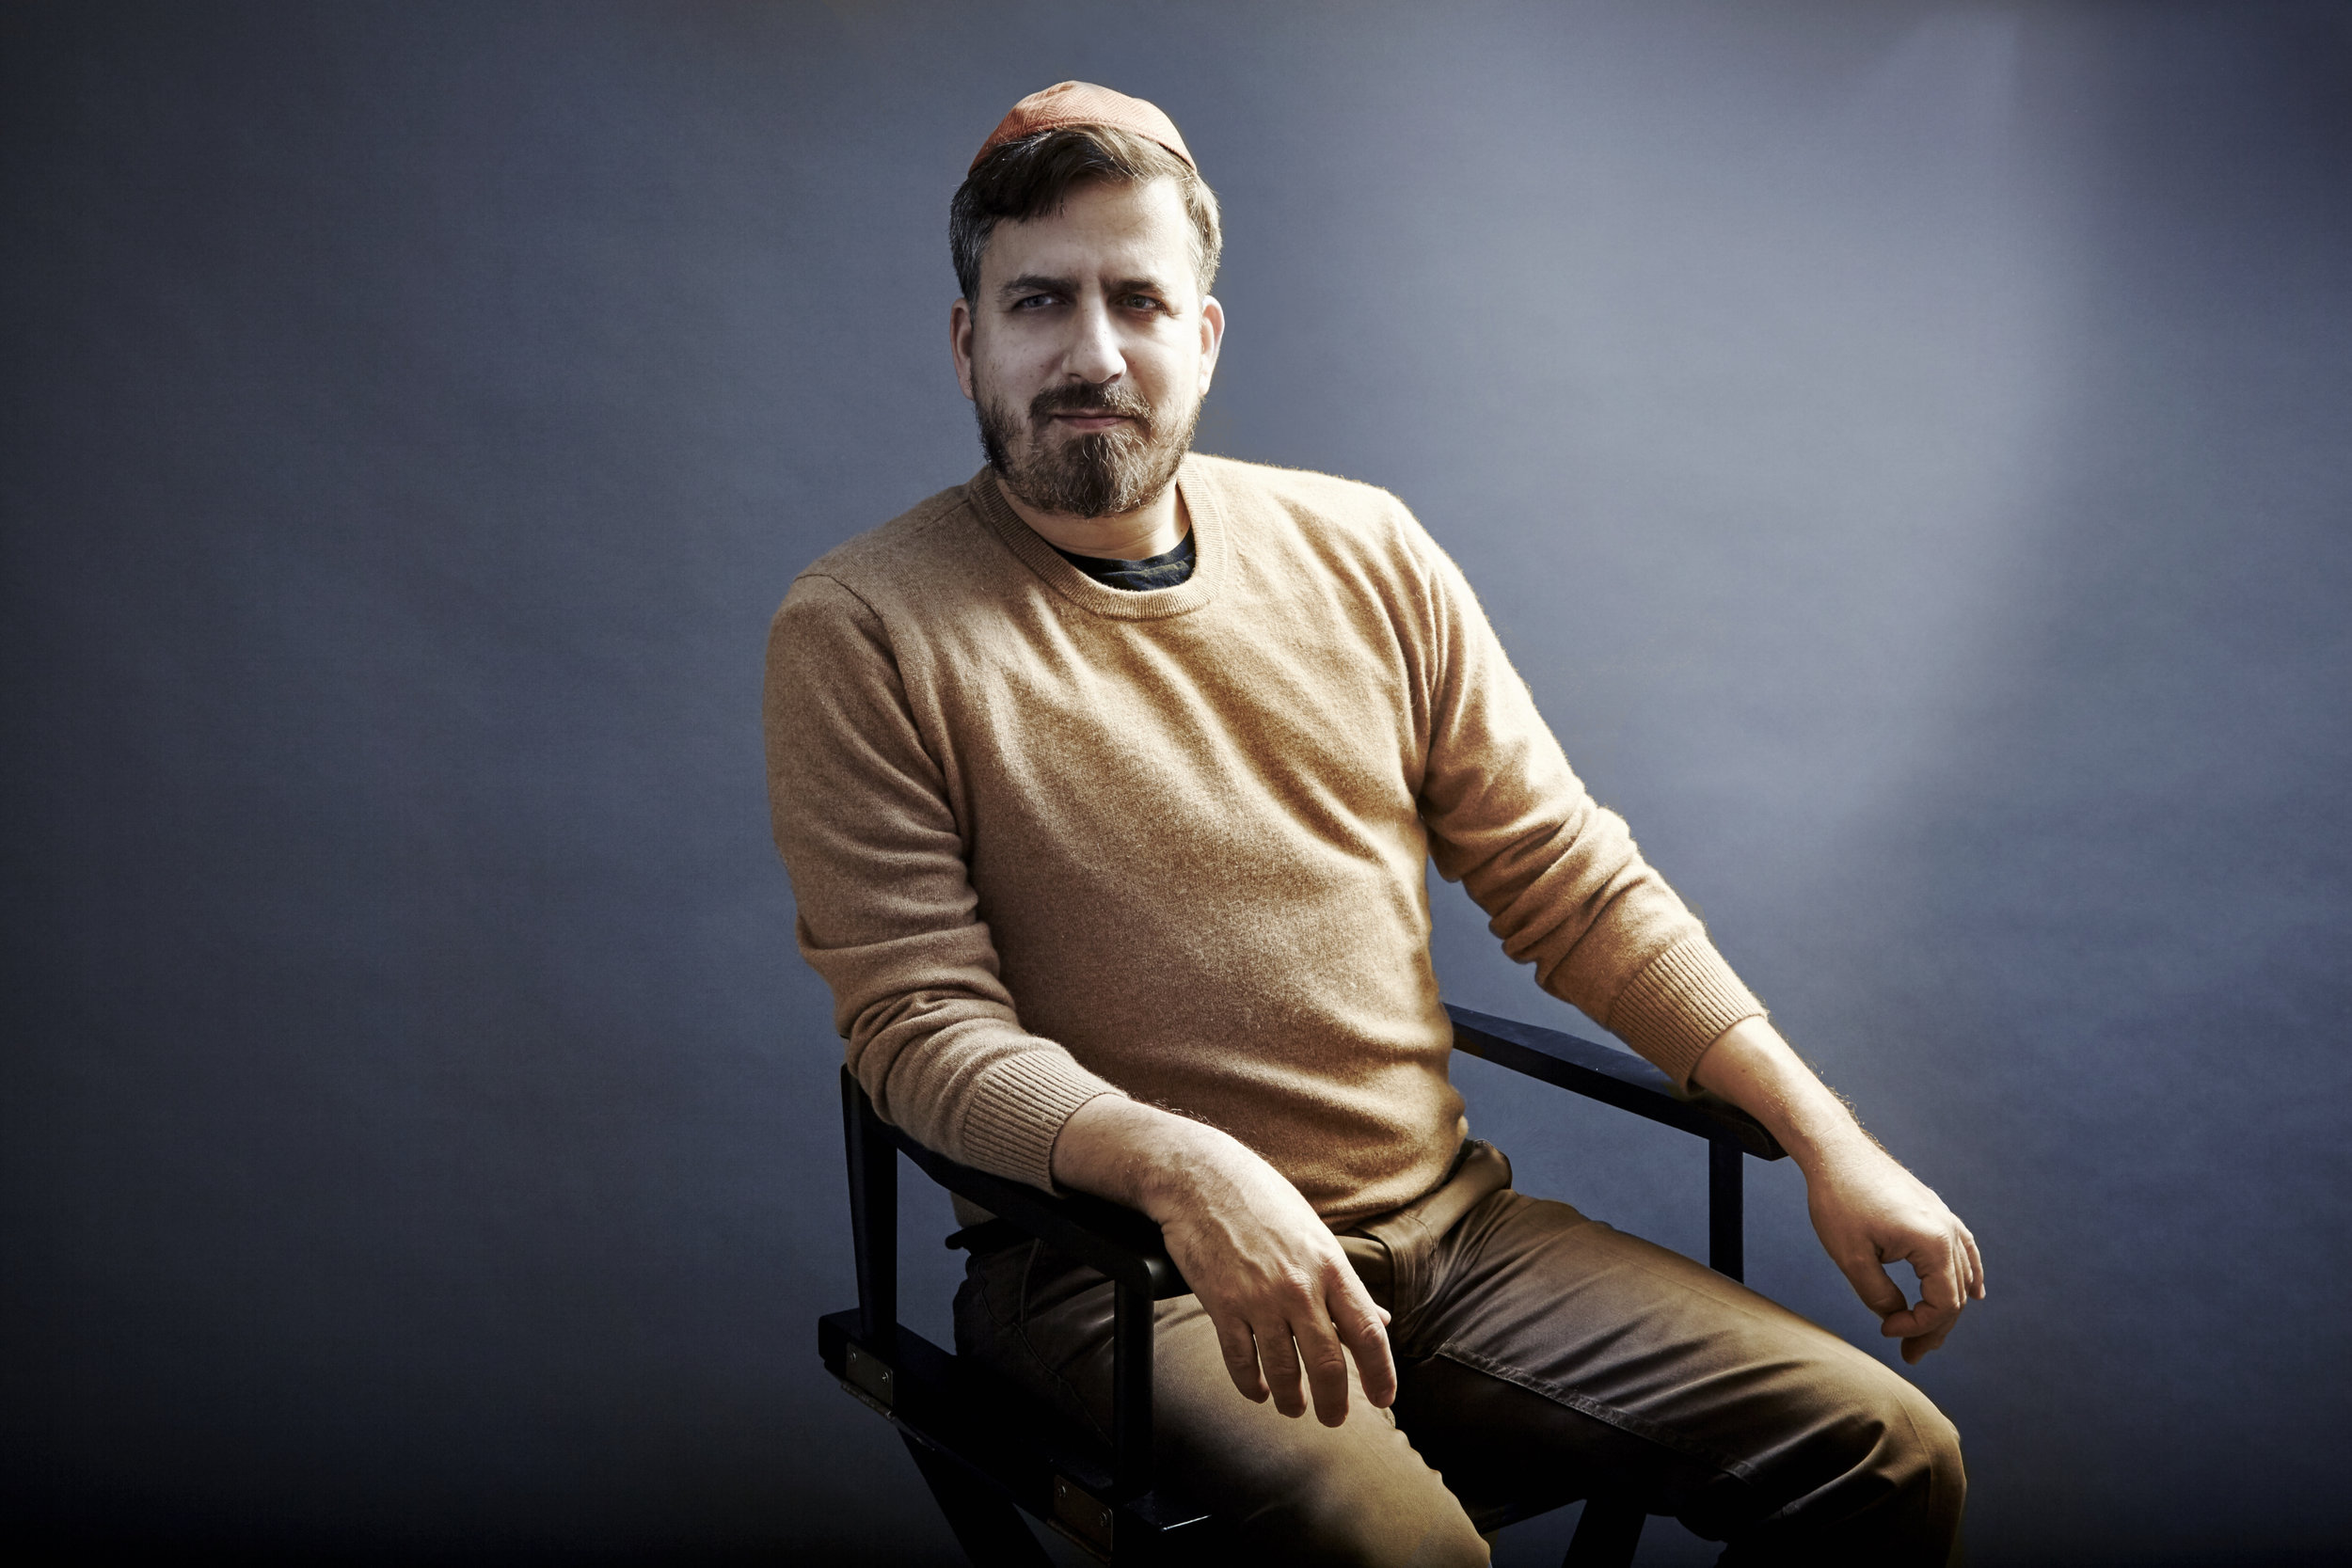 DANNY FINKELMAN, FILM DIRECTOR AND PRODUCER